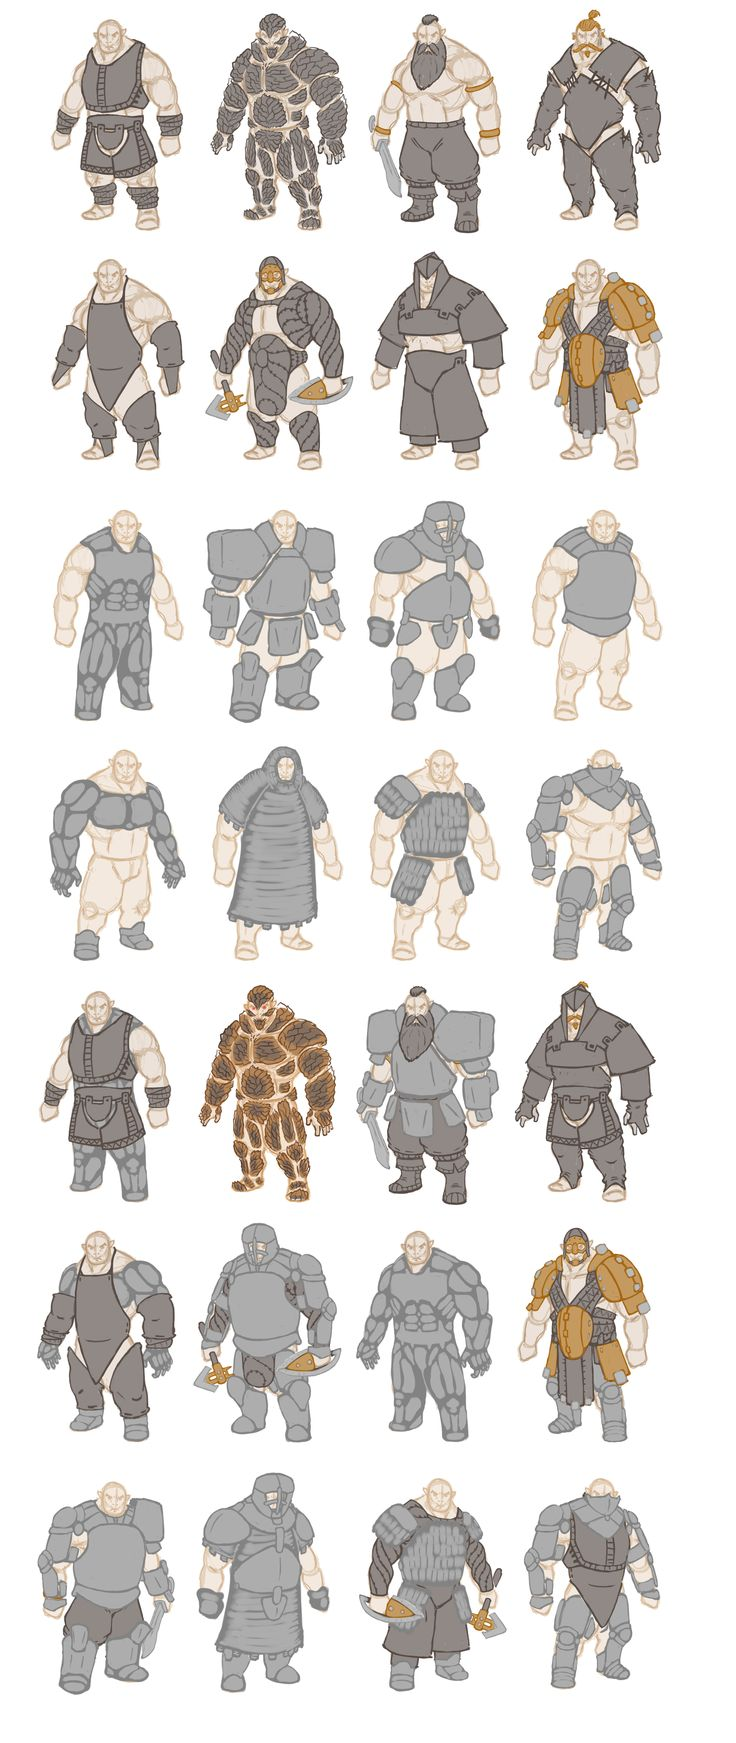 Dwarf concept variation